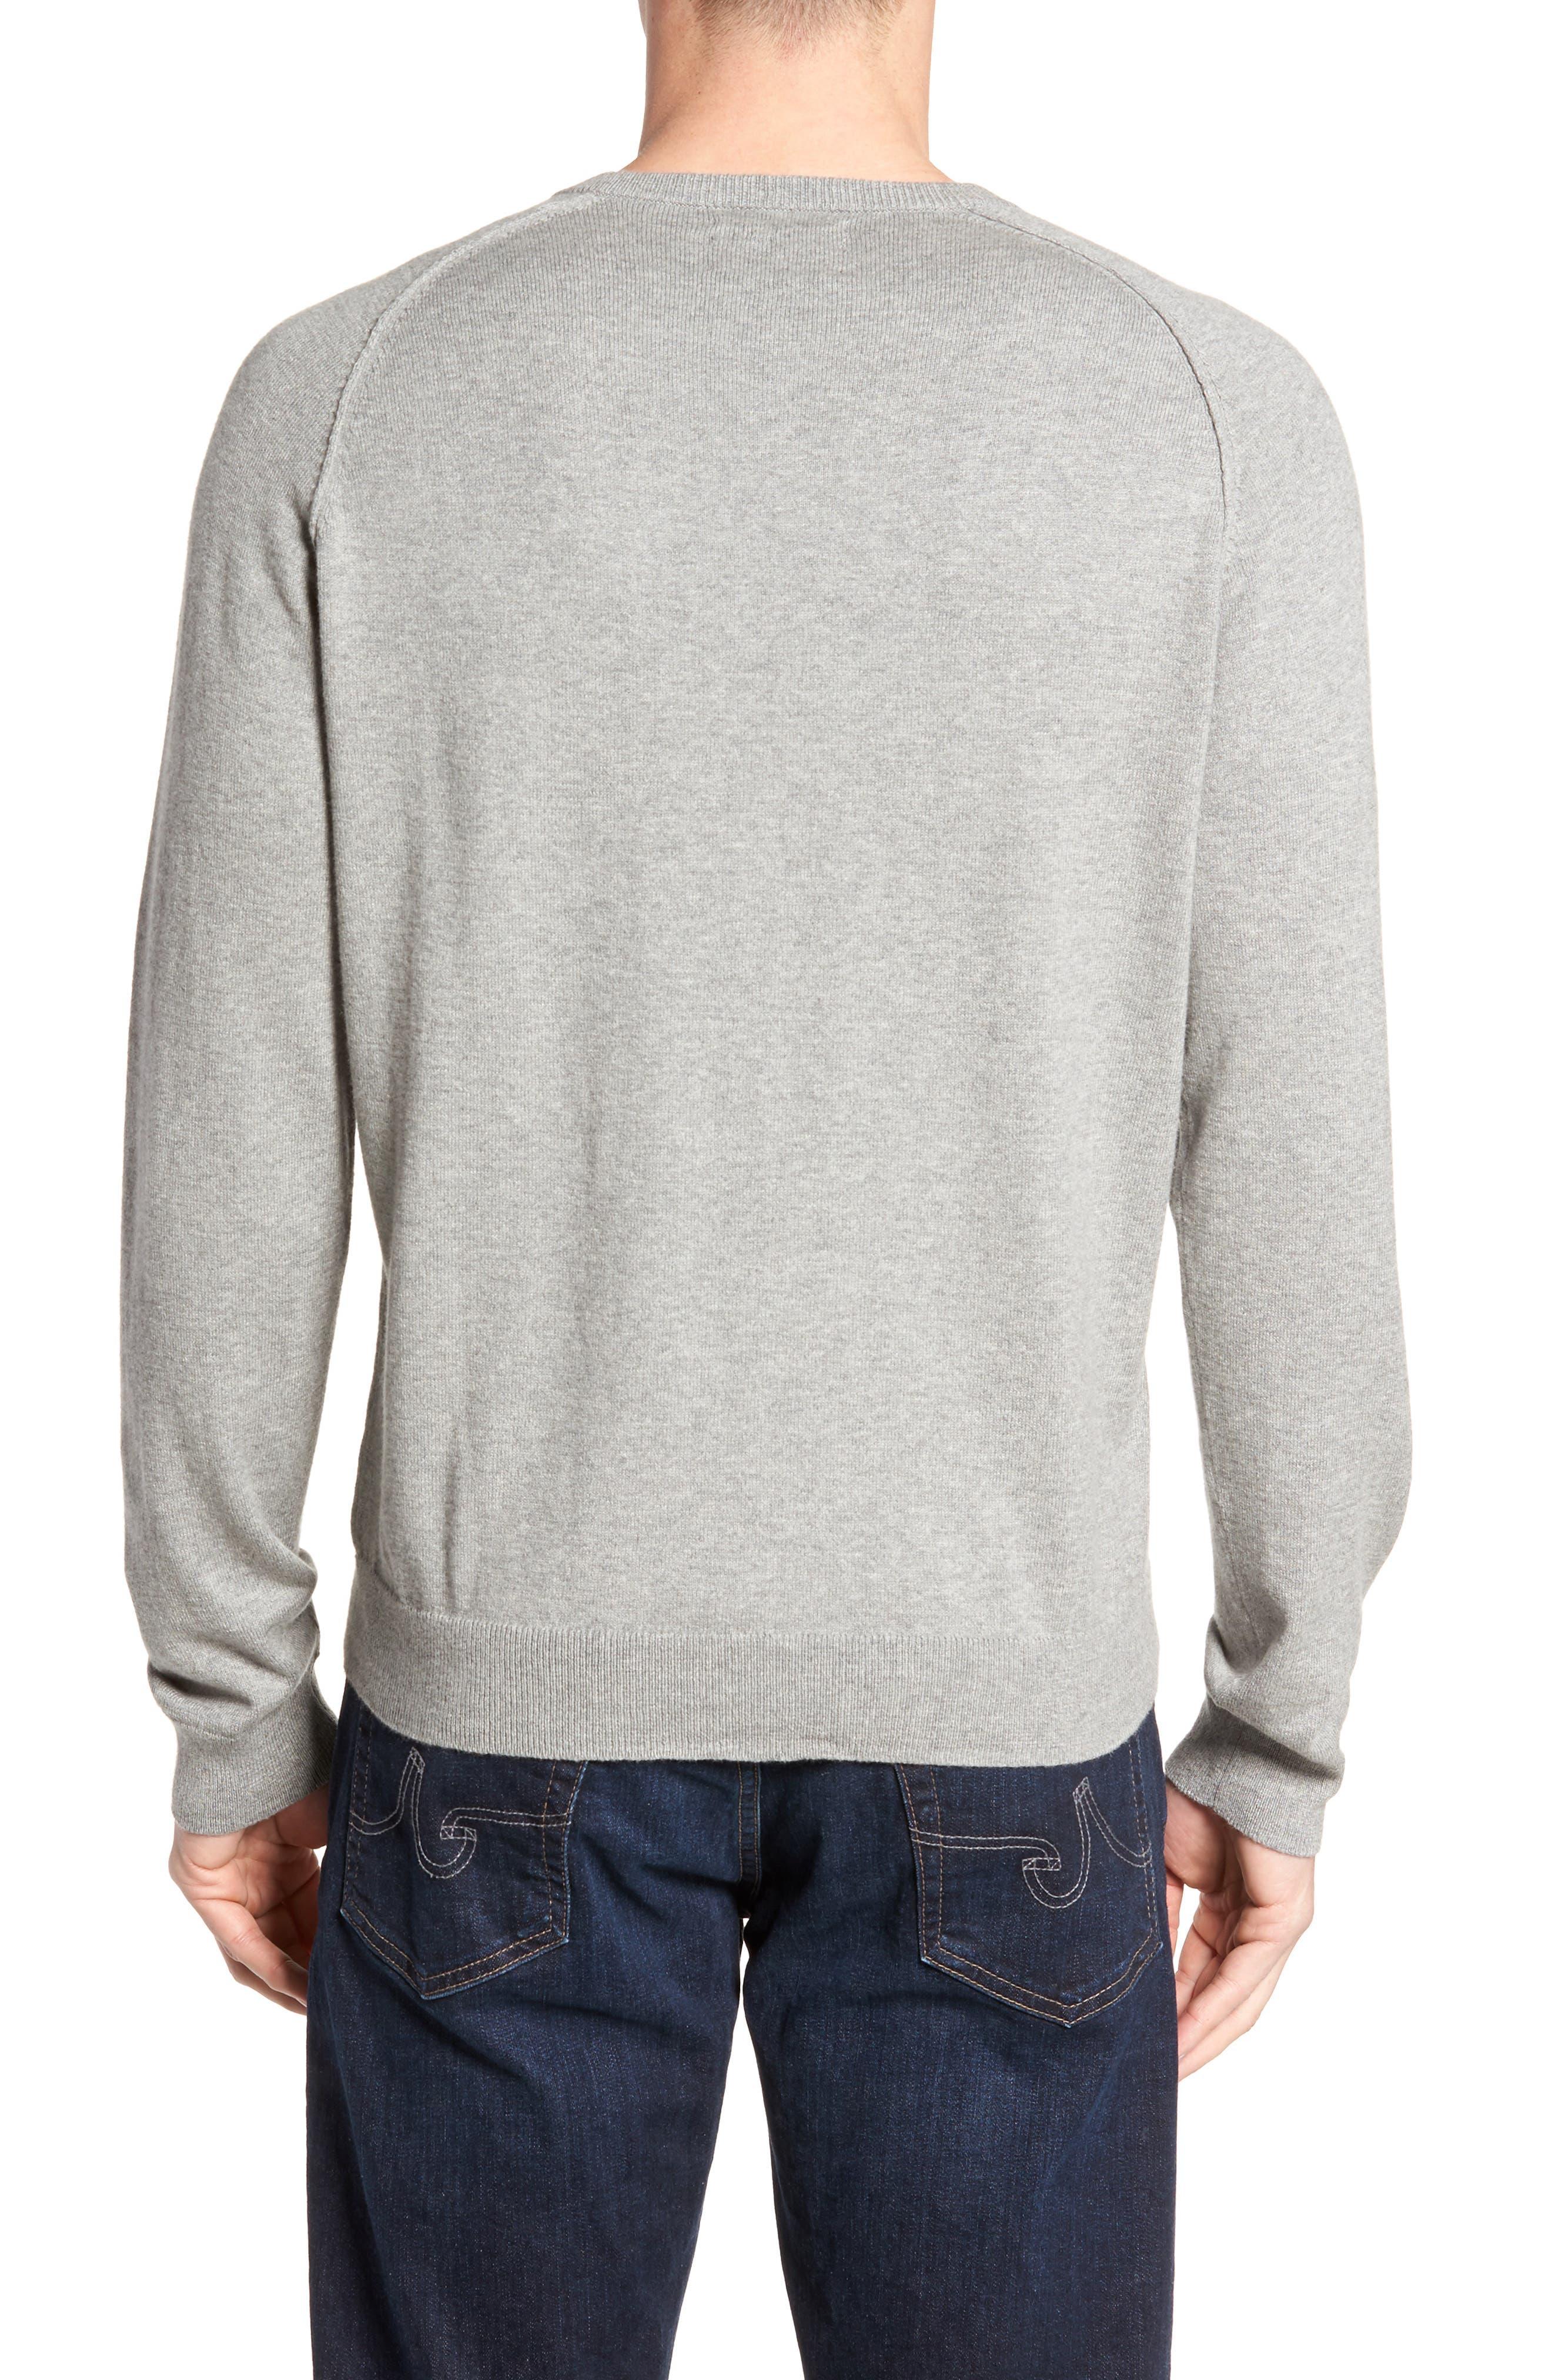 Saddle Shoulder Cotton & Cashmere Sweater,                             Alternate thumbnail 2, color,                             Grey Heather